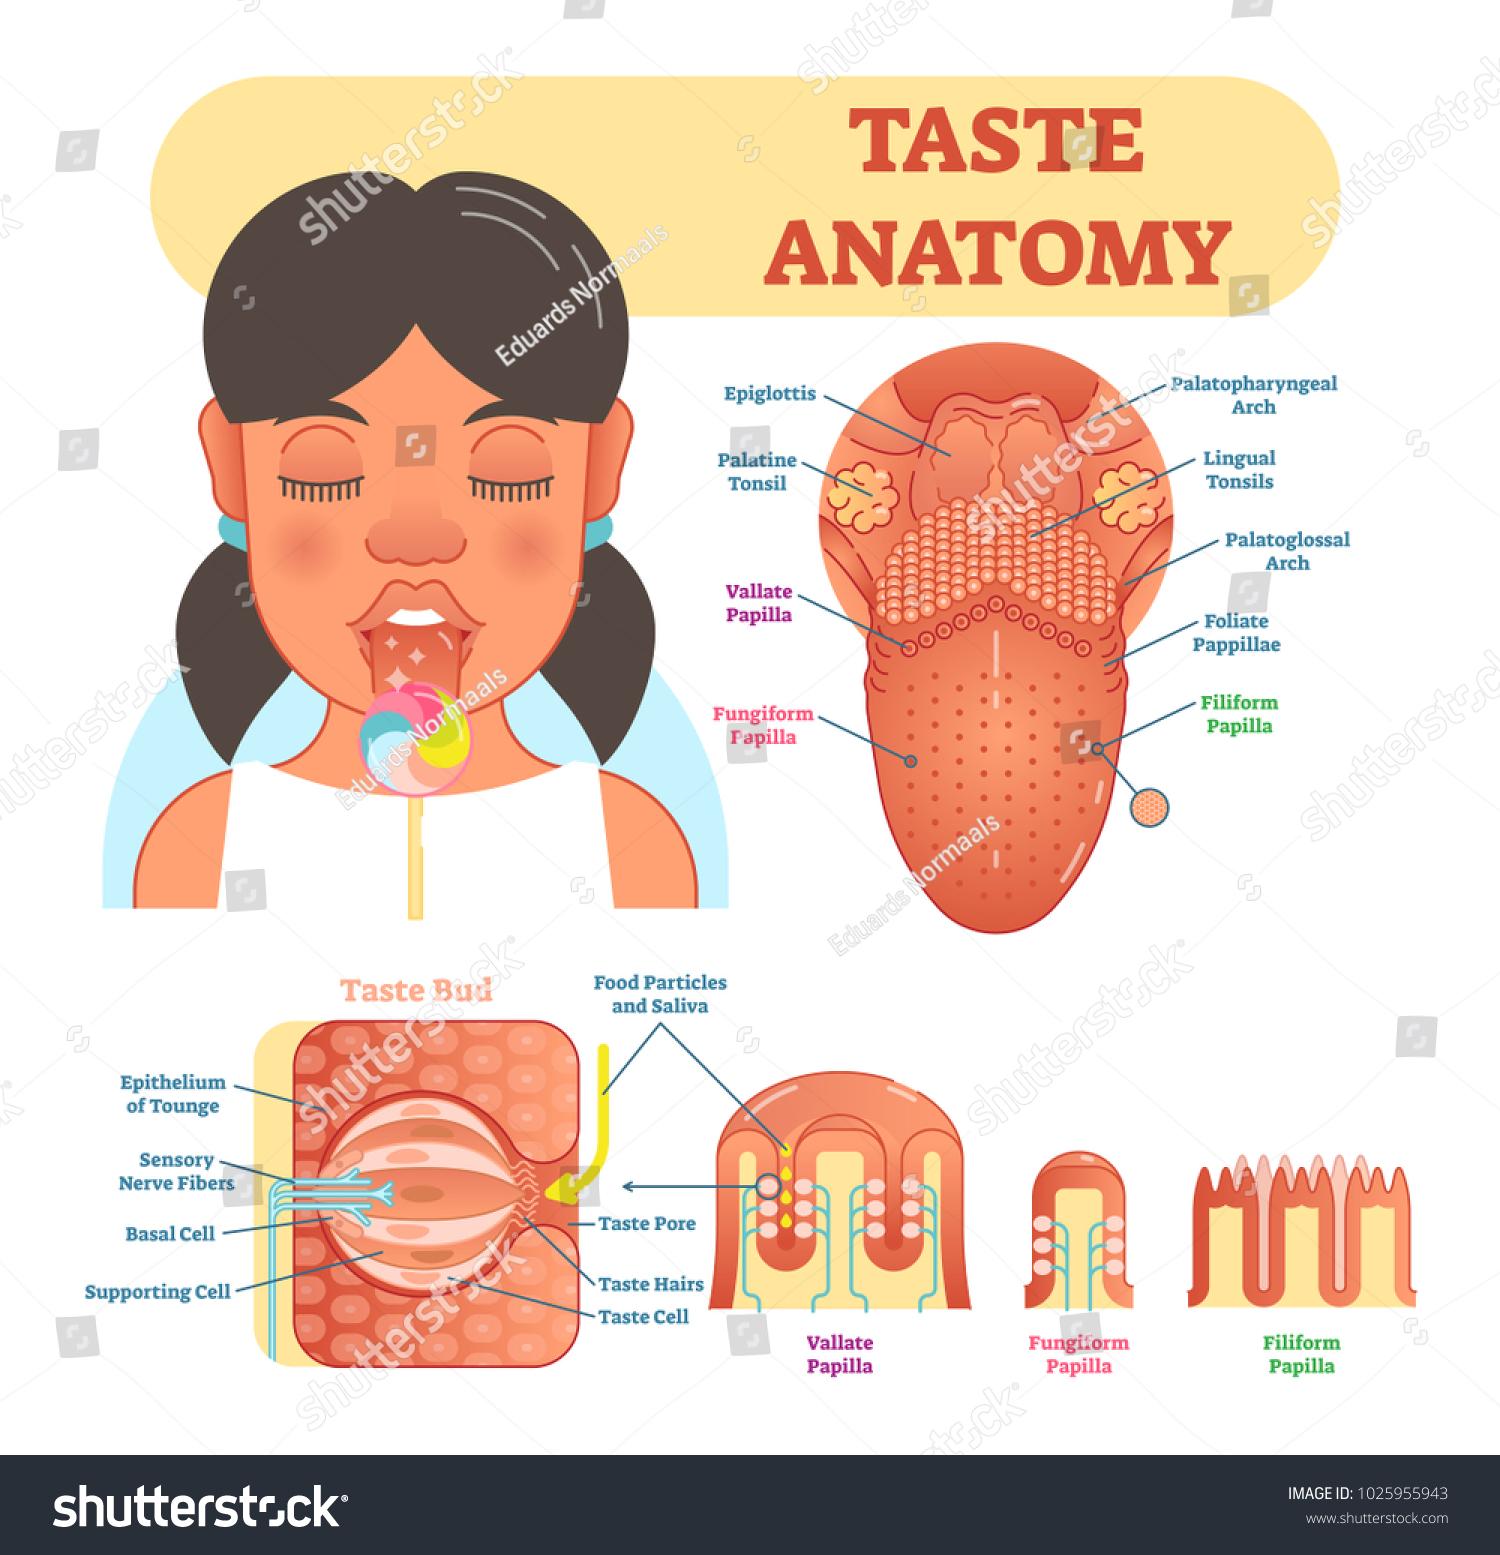 Taste Anatomy Vector Illustration Diagram Educational Stock Vector ...